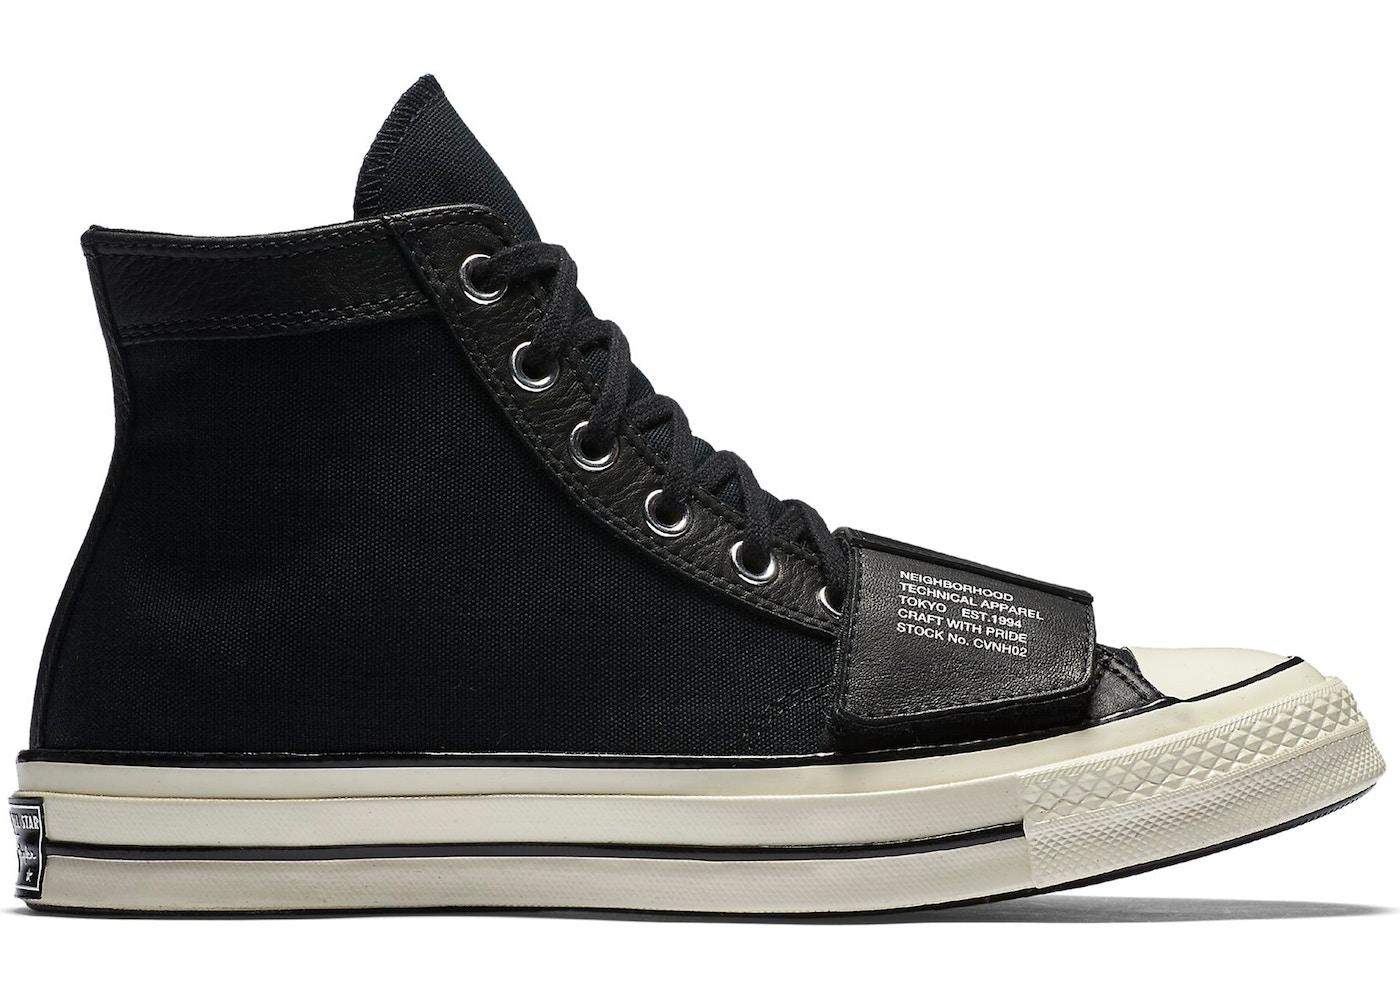 1641dedc19db80 Converse Chuck Taylor All-Star 70s Hi Neighborhood Black - 158602C-001